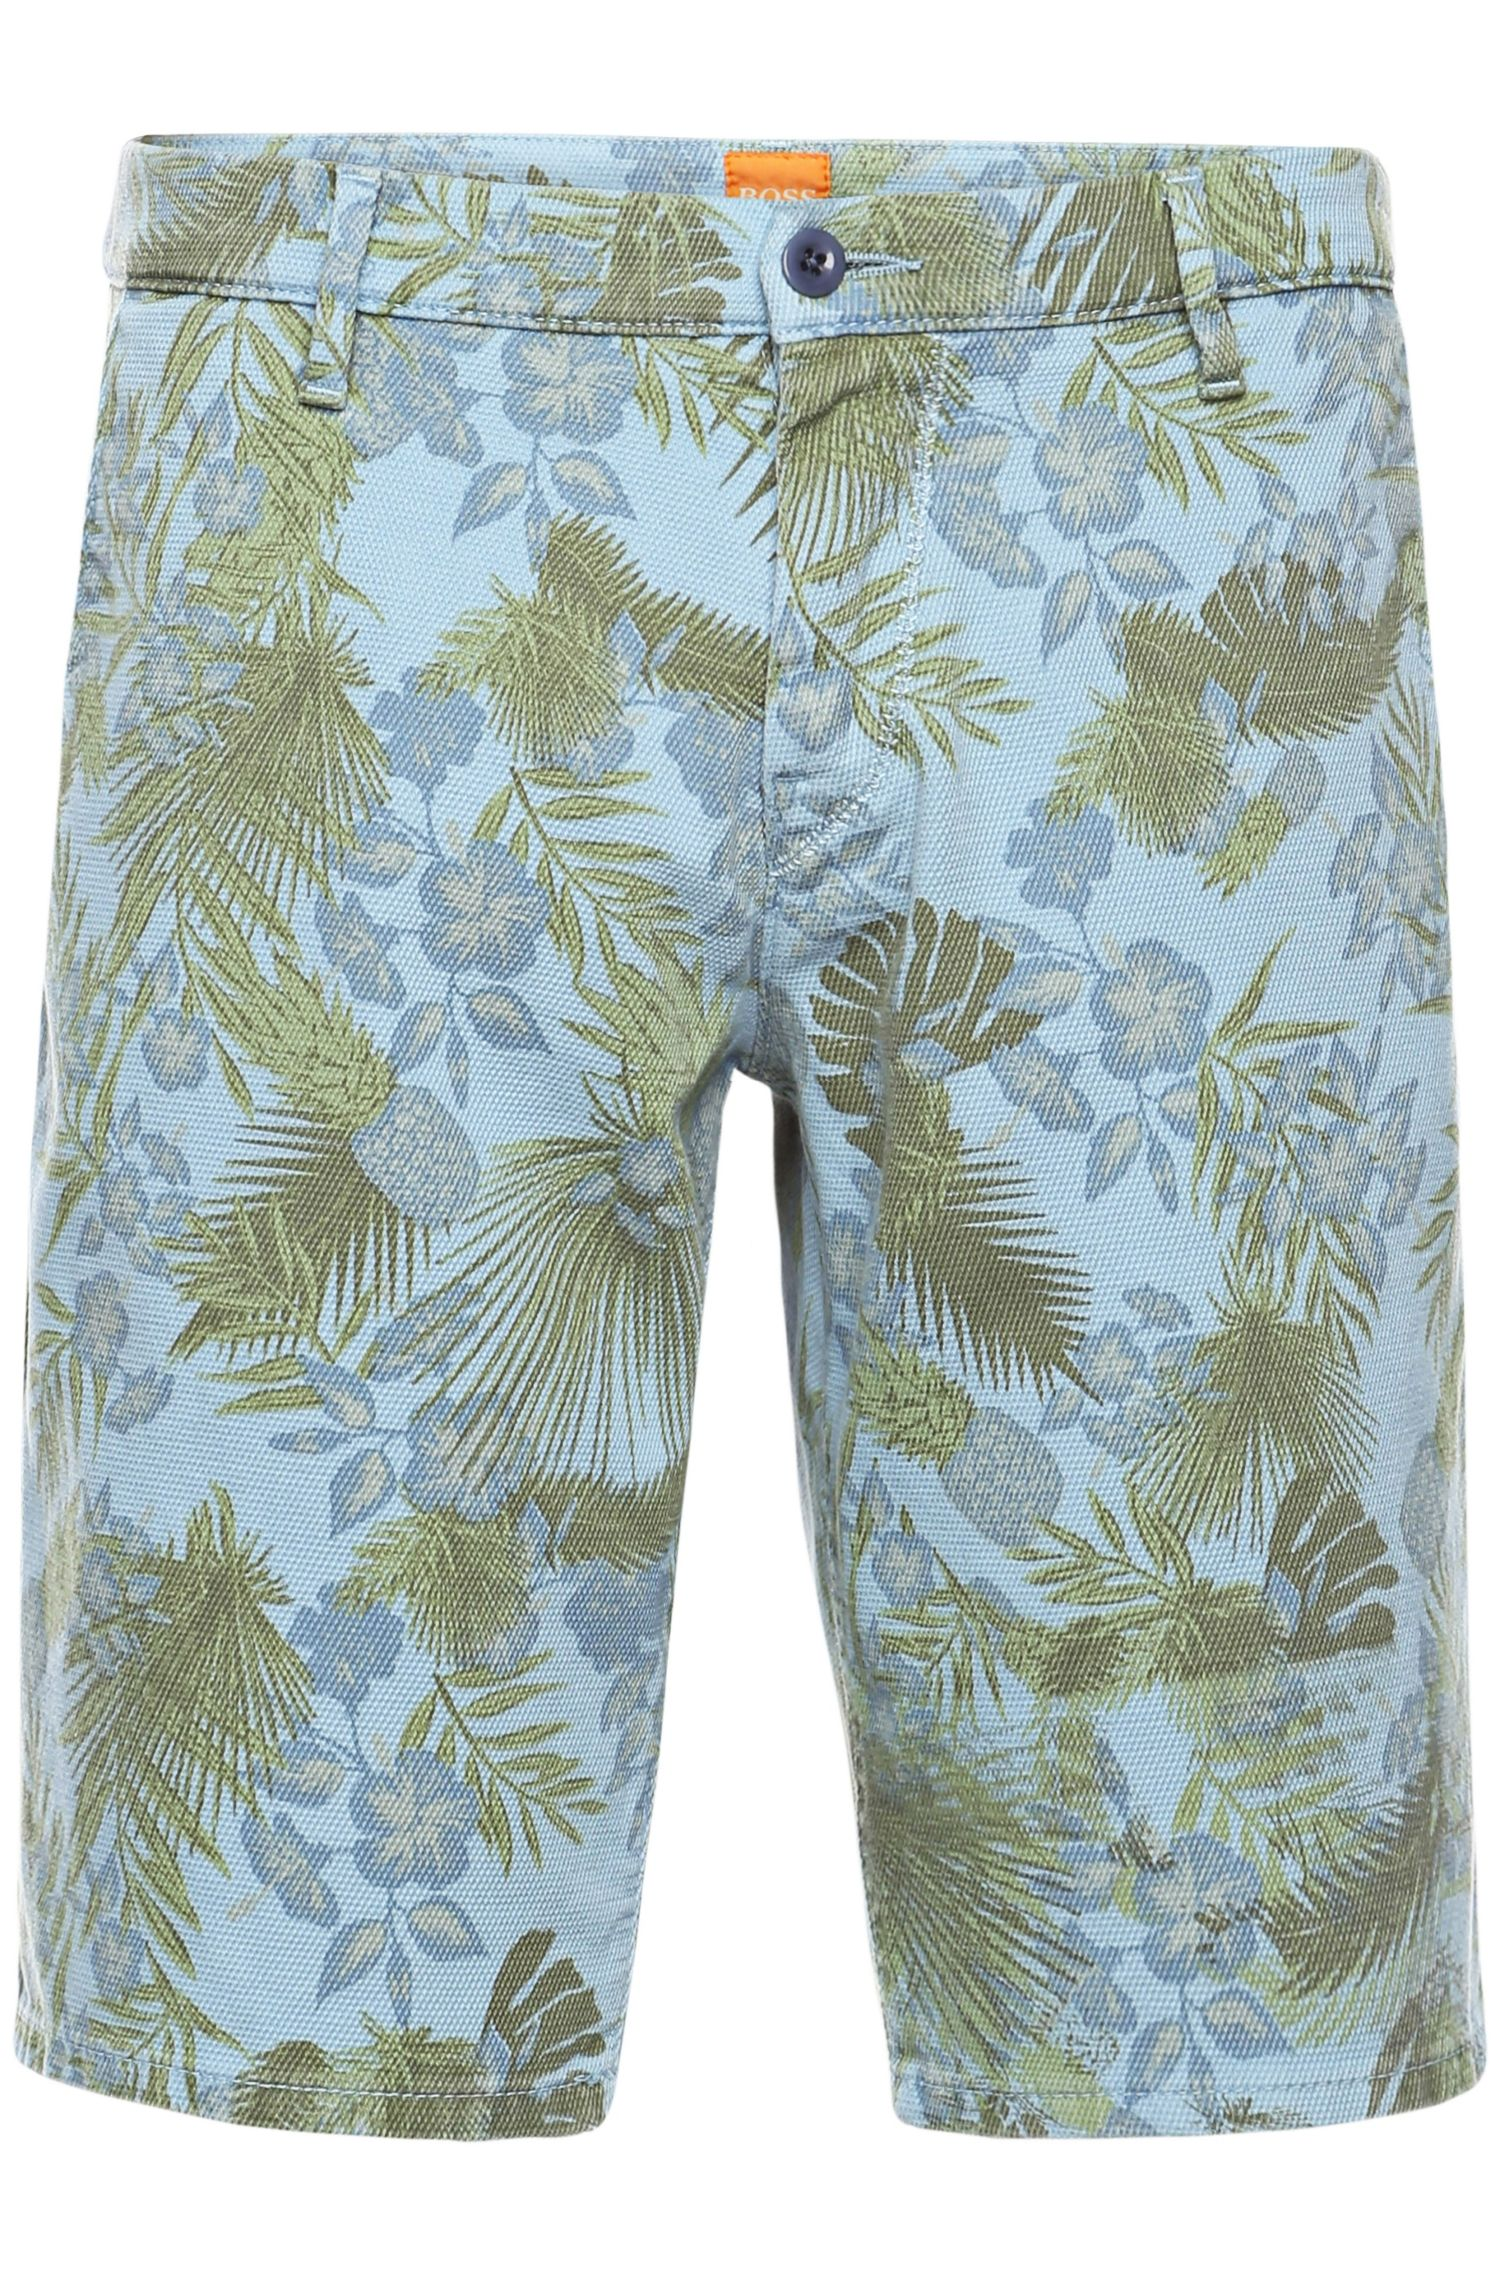 Gemusterte Slim-Fit Shorts aus Baumwoll-Mix: ´Sairy8-Shorts-D`